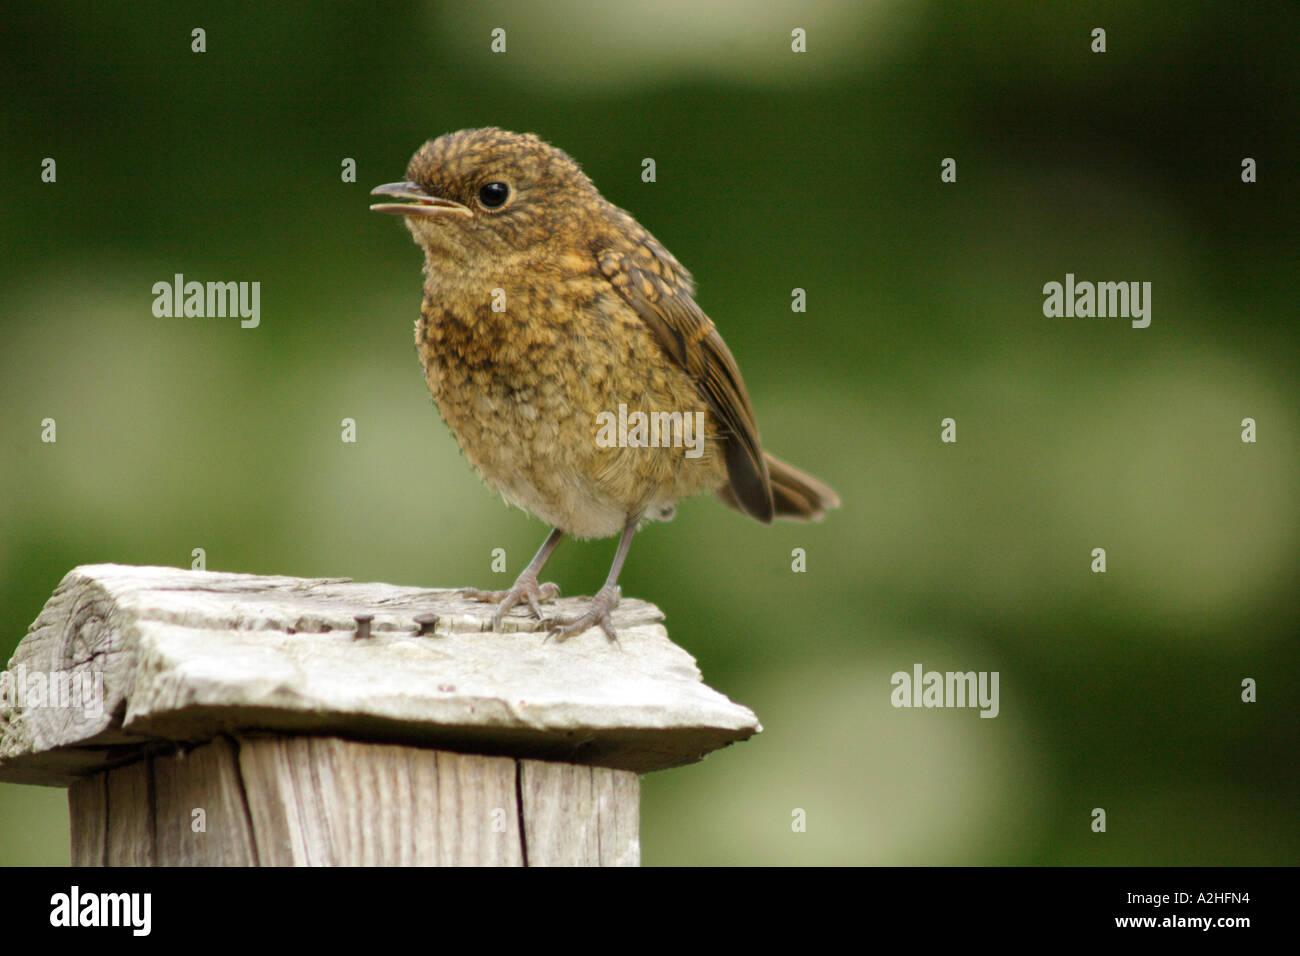 Robin, Erithacus rubecula, fledgling on garden fence, UK Stock Photo